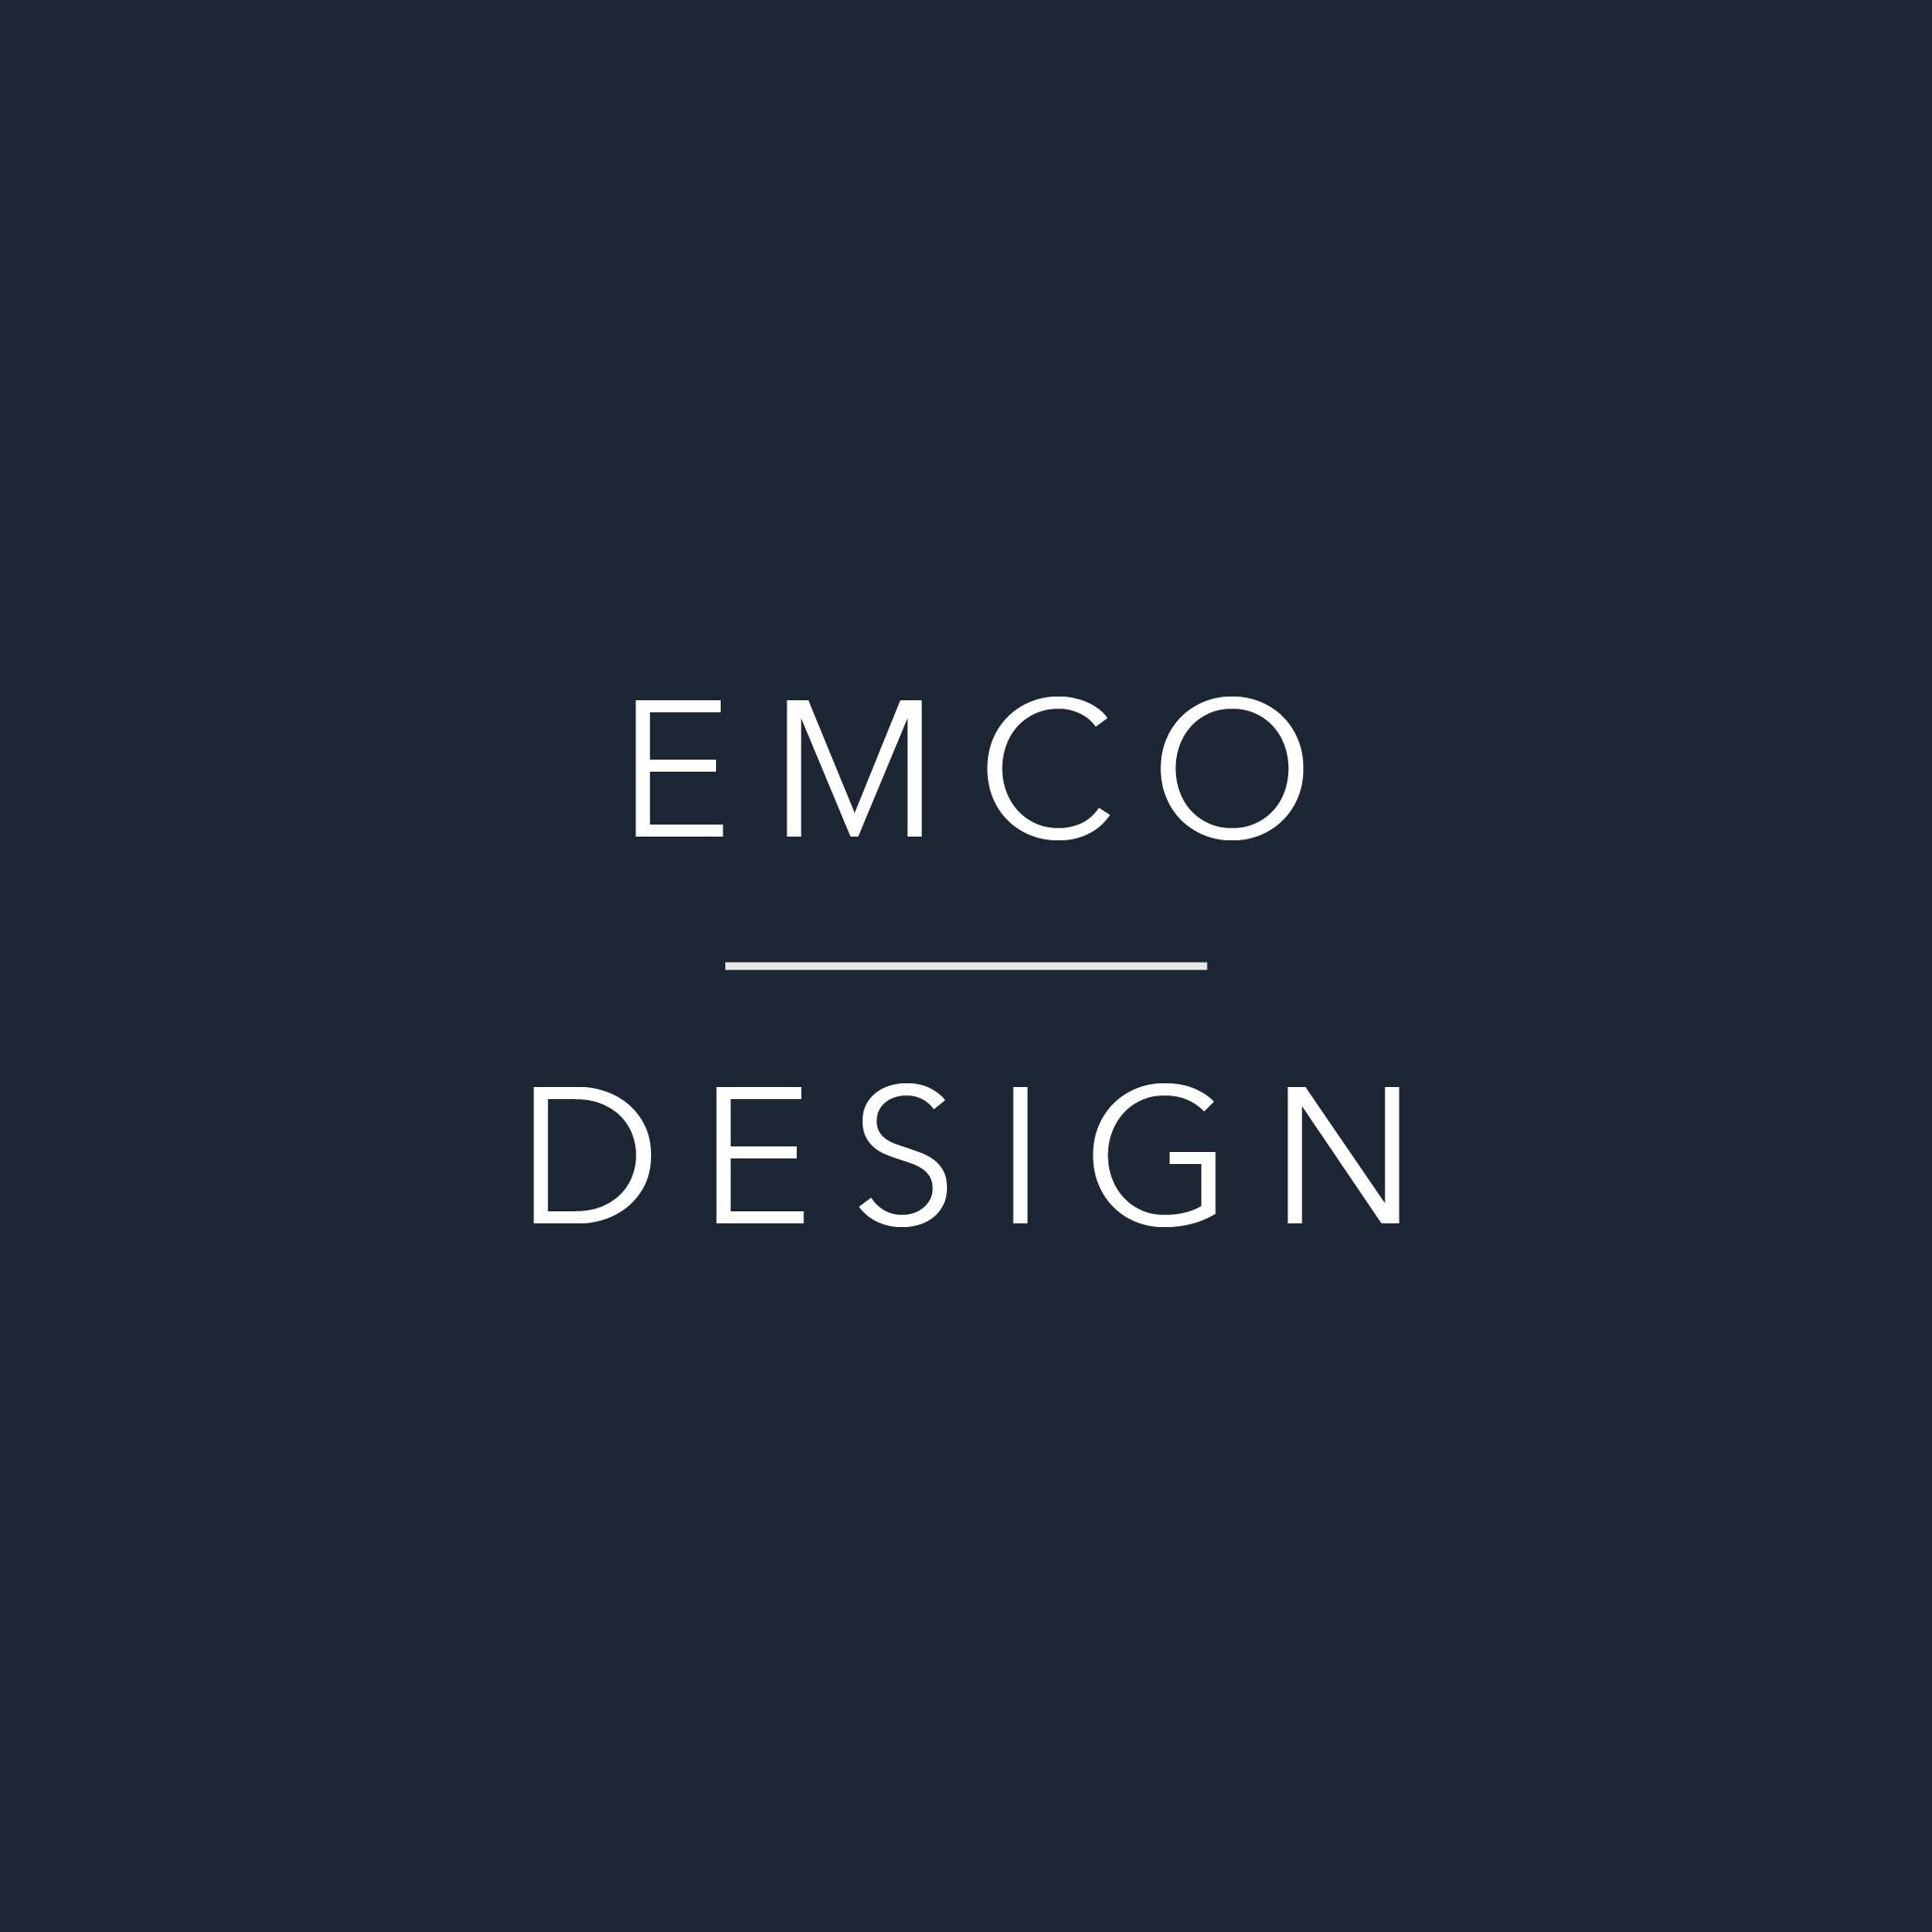 EMCO Design por EmandCoDesign en Etsy